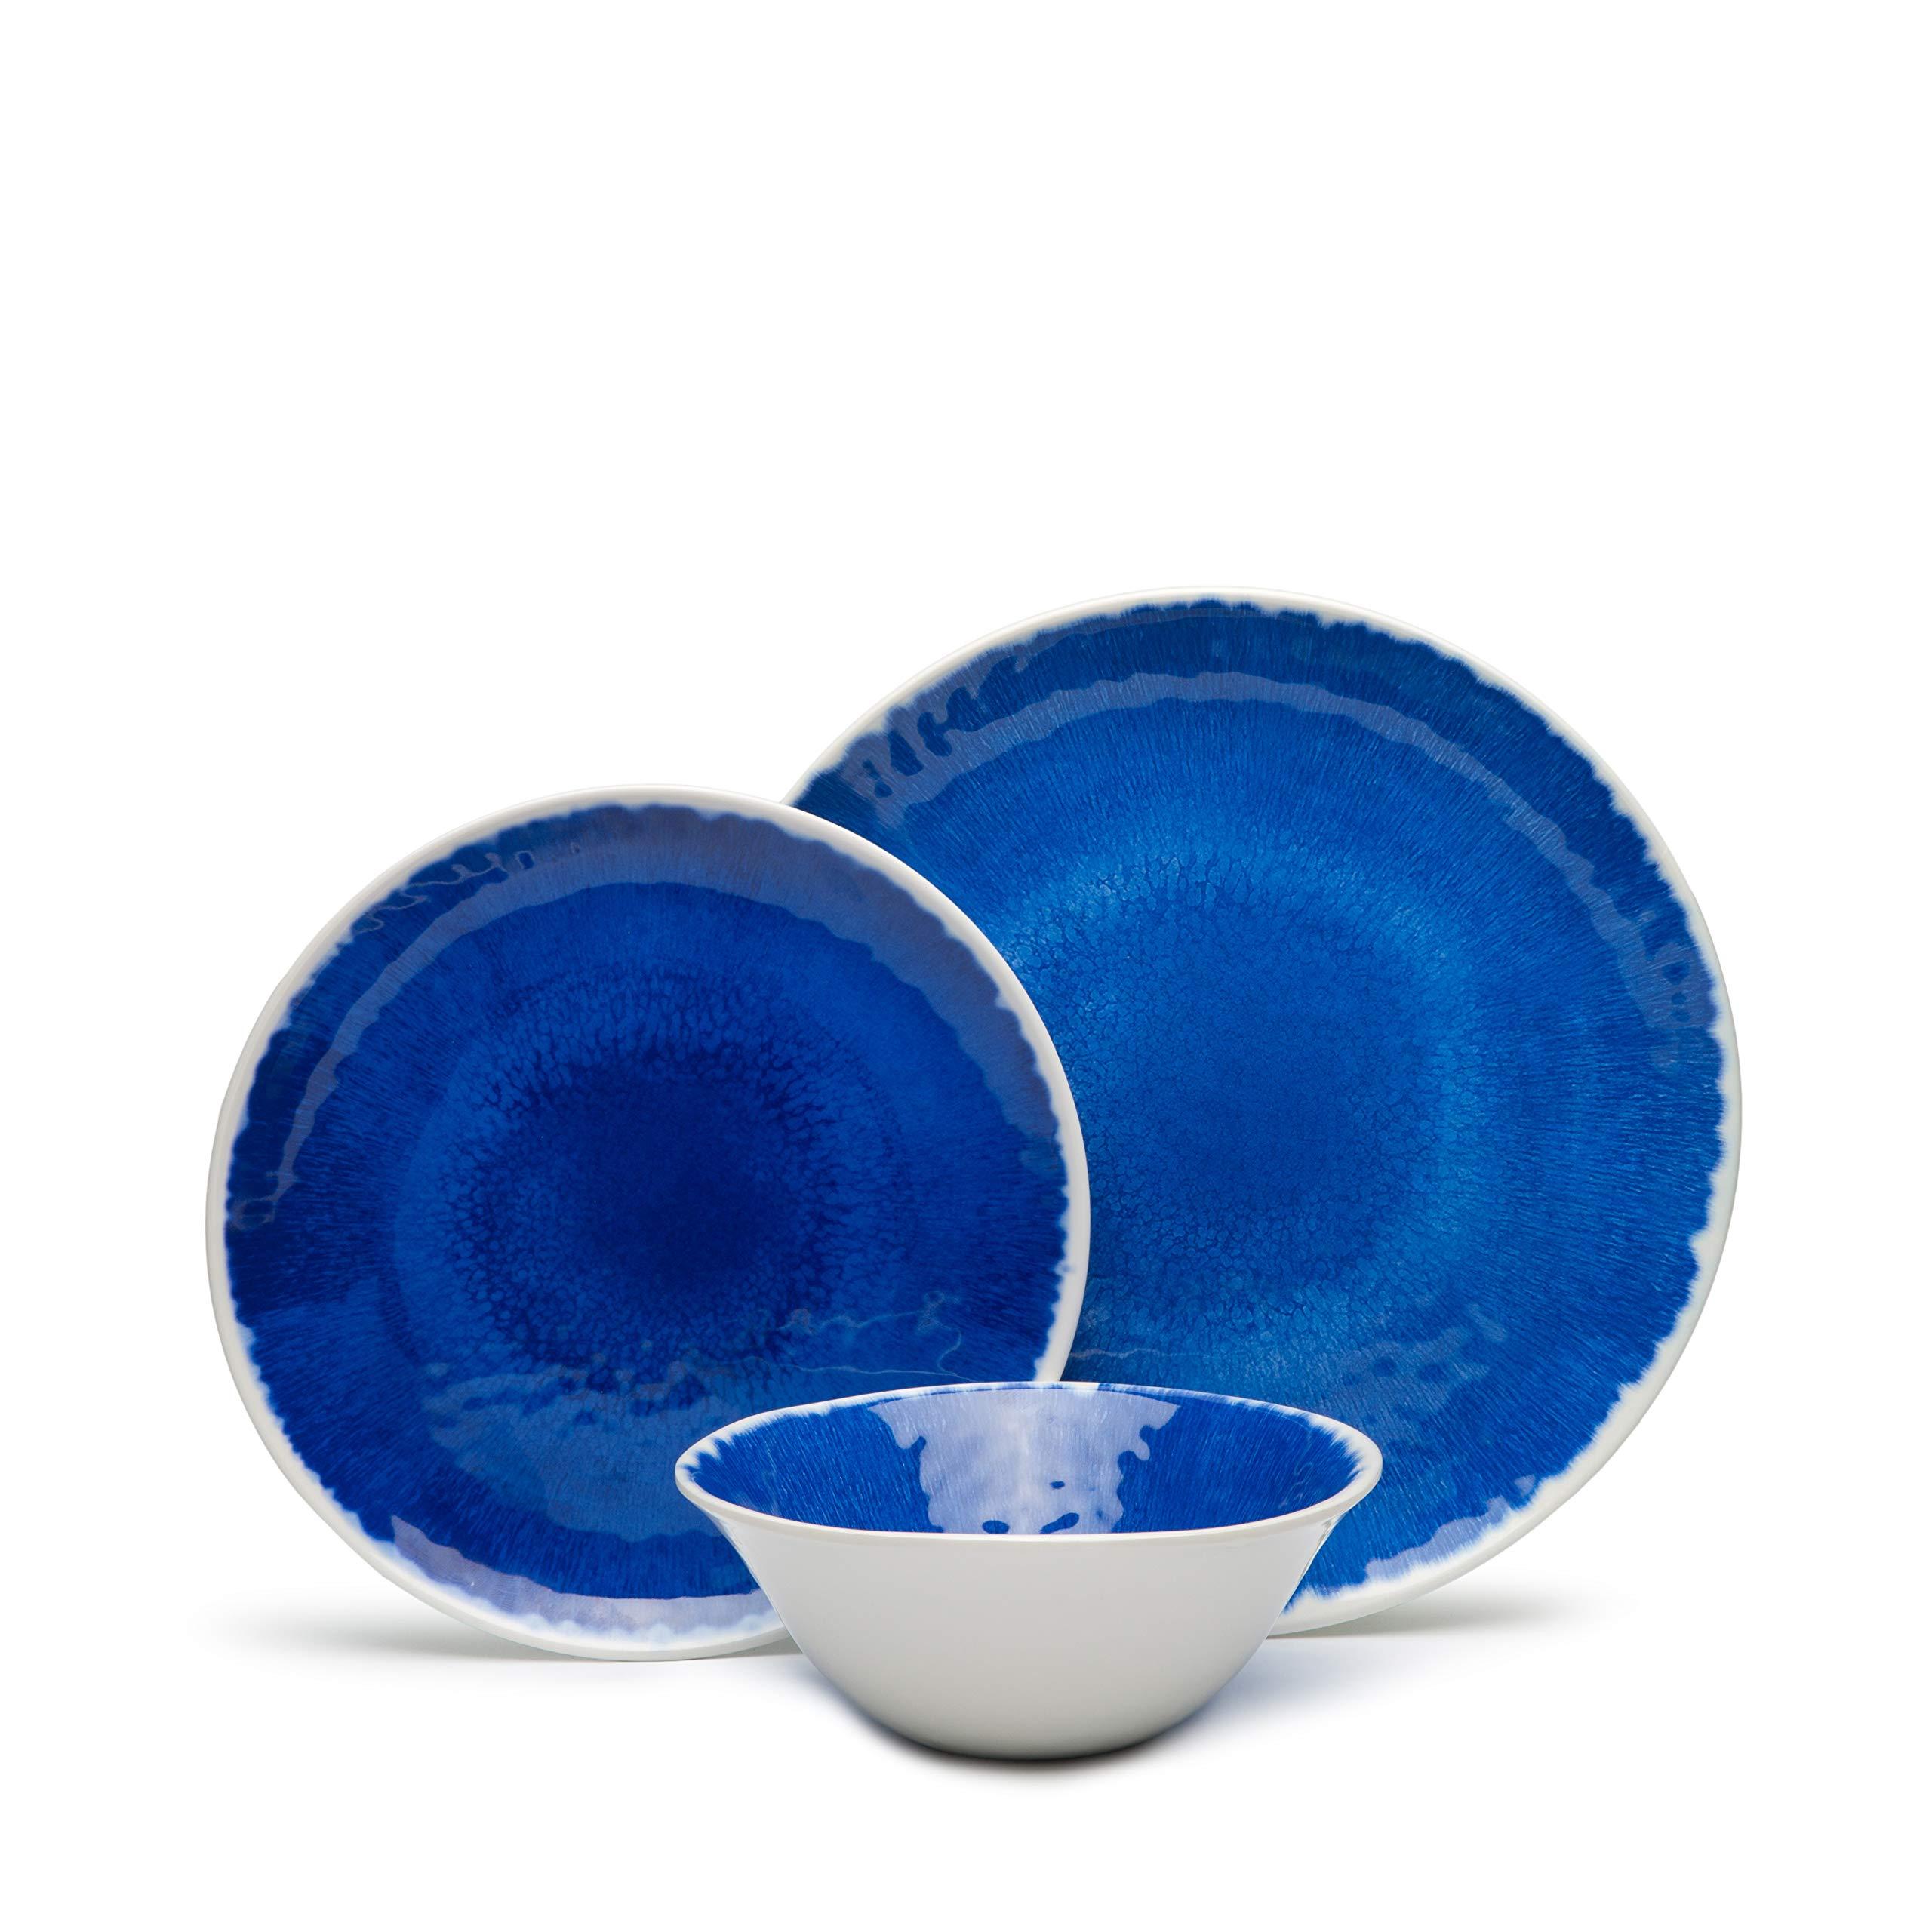 12-Piece Melamine Dinnerware Set, Dinnerware Set for 4, Dishwasher Safe, BPA free,Unbreakable,Blue